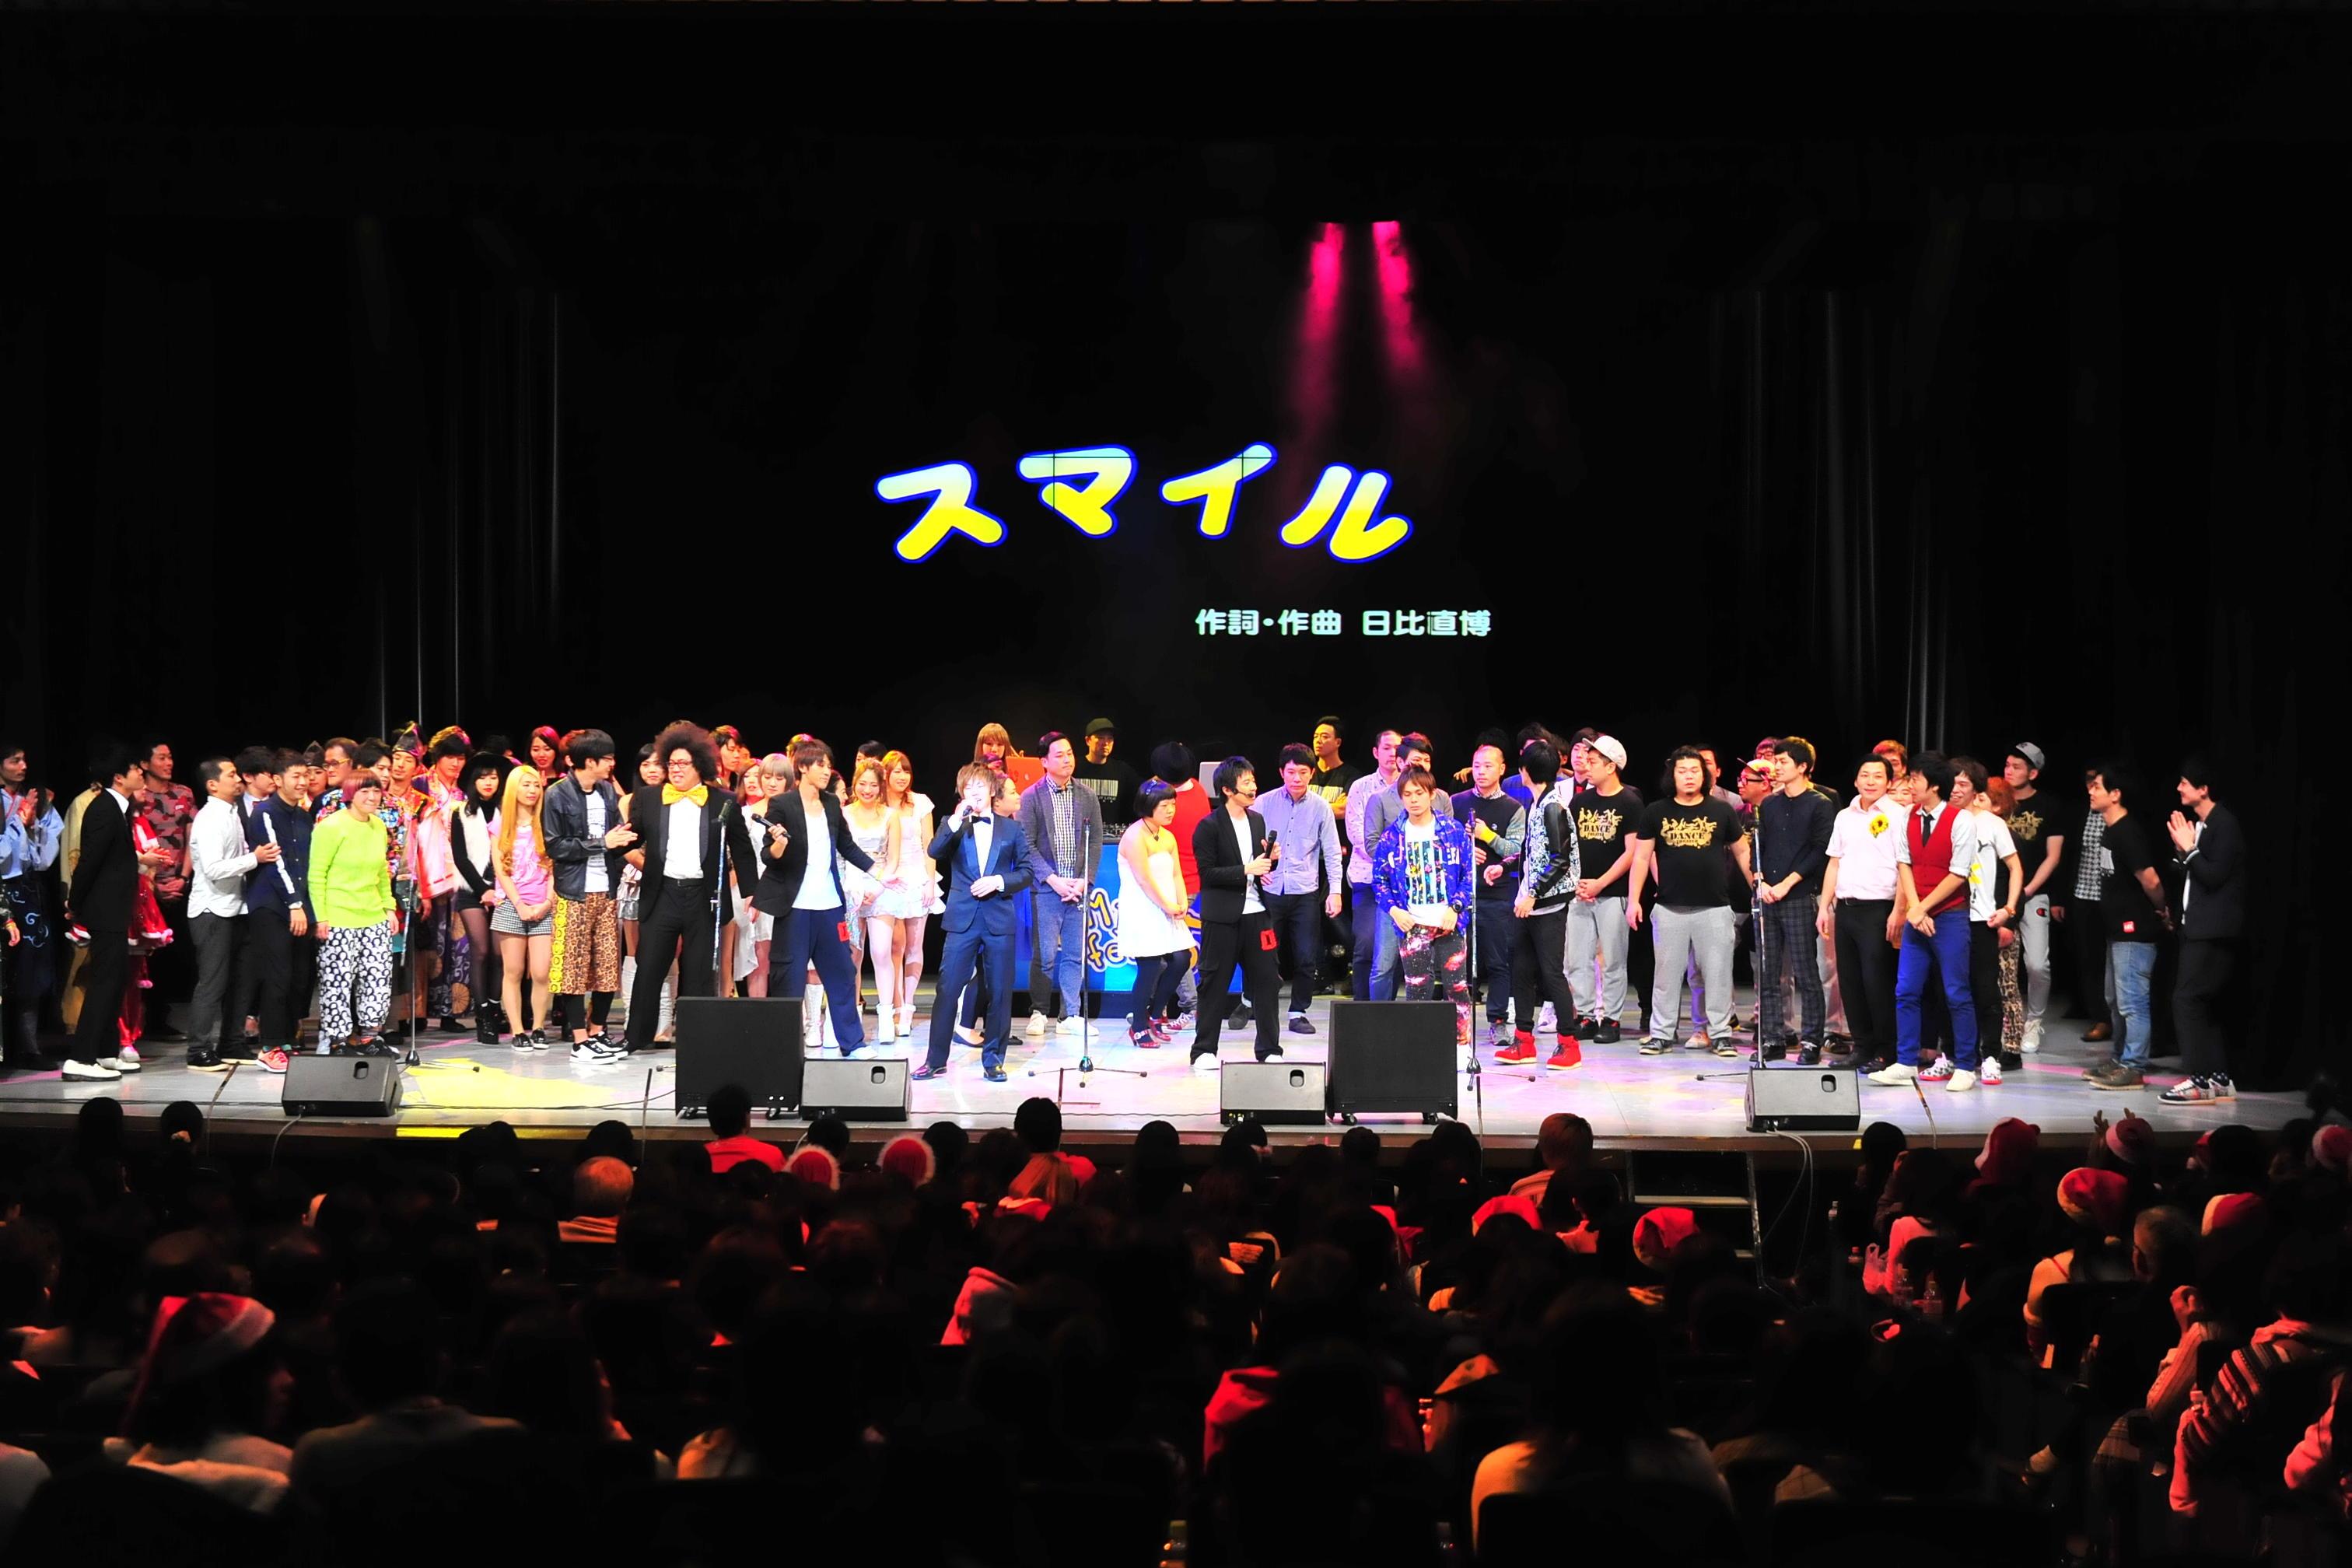 http://news.yoshimoto.co.jp/20151231143847-83a0d949341b262904973968cfe7d87ce4215999.jpg